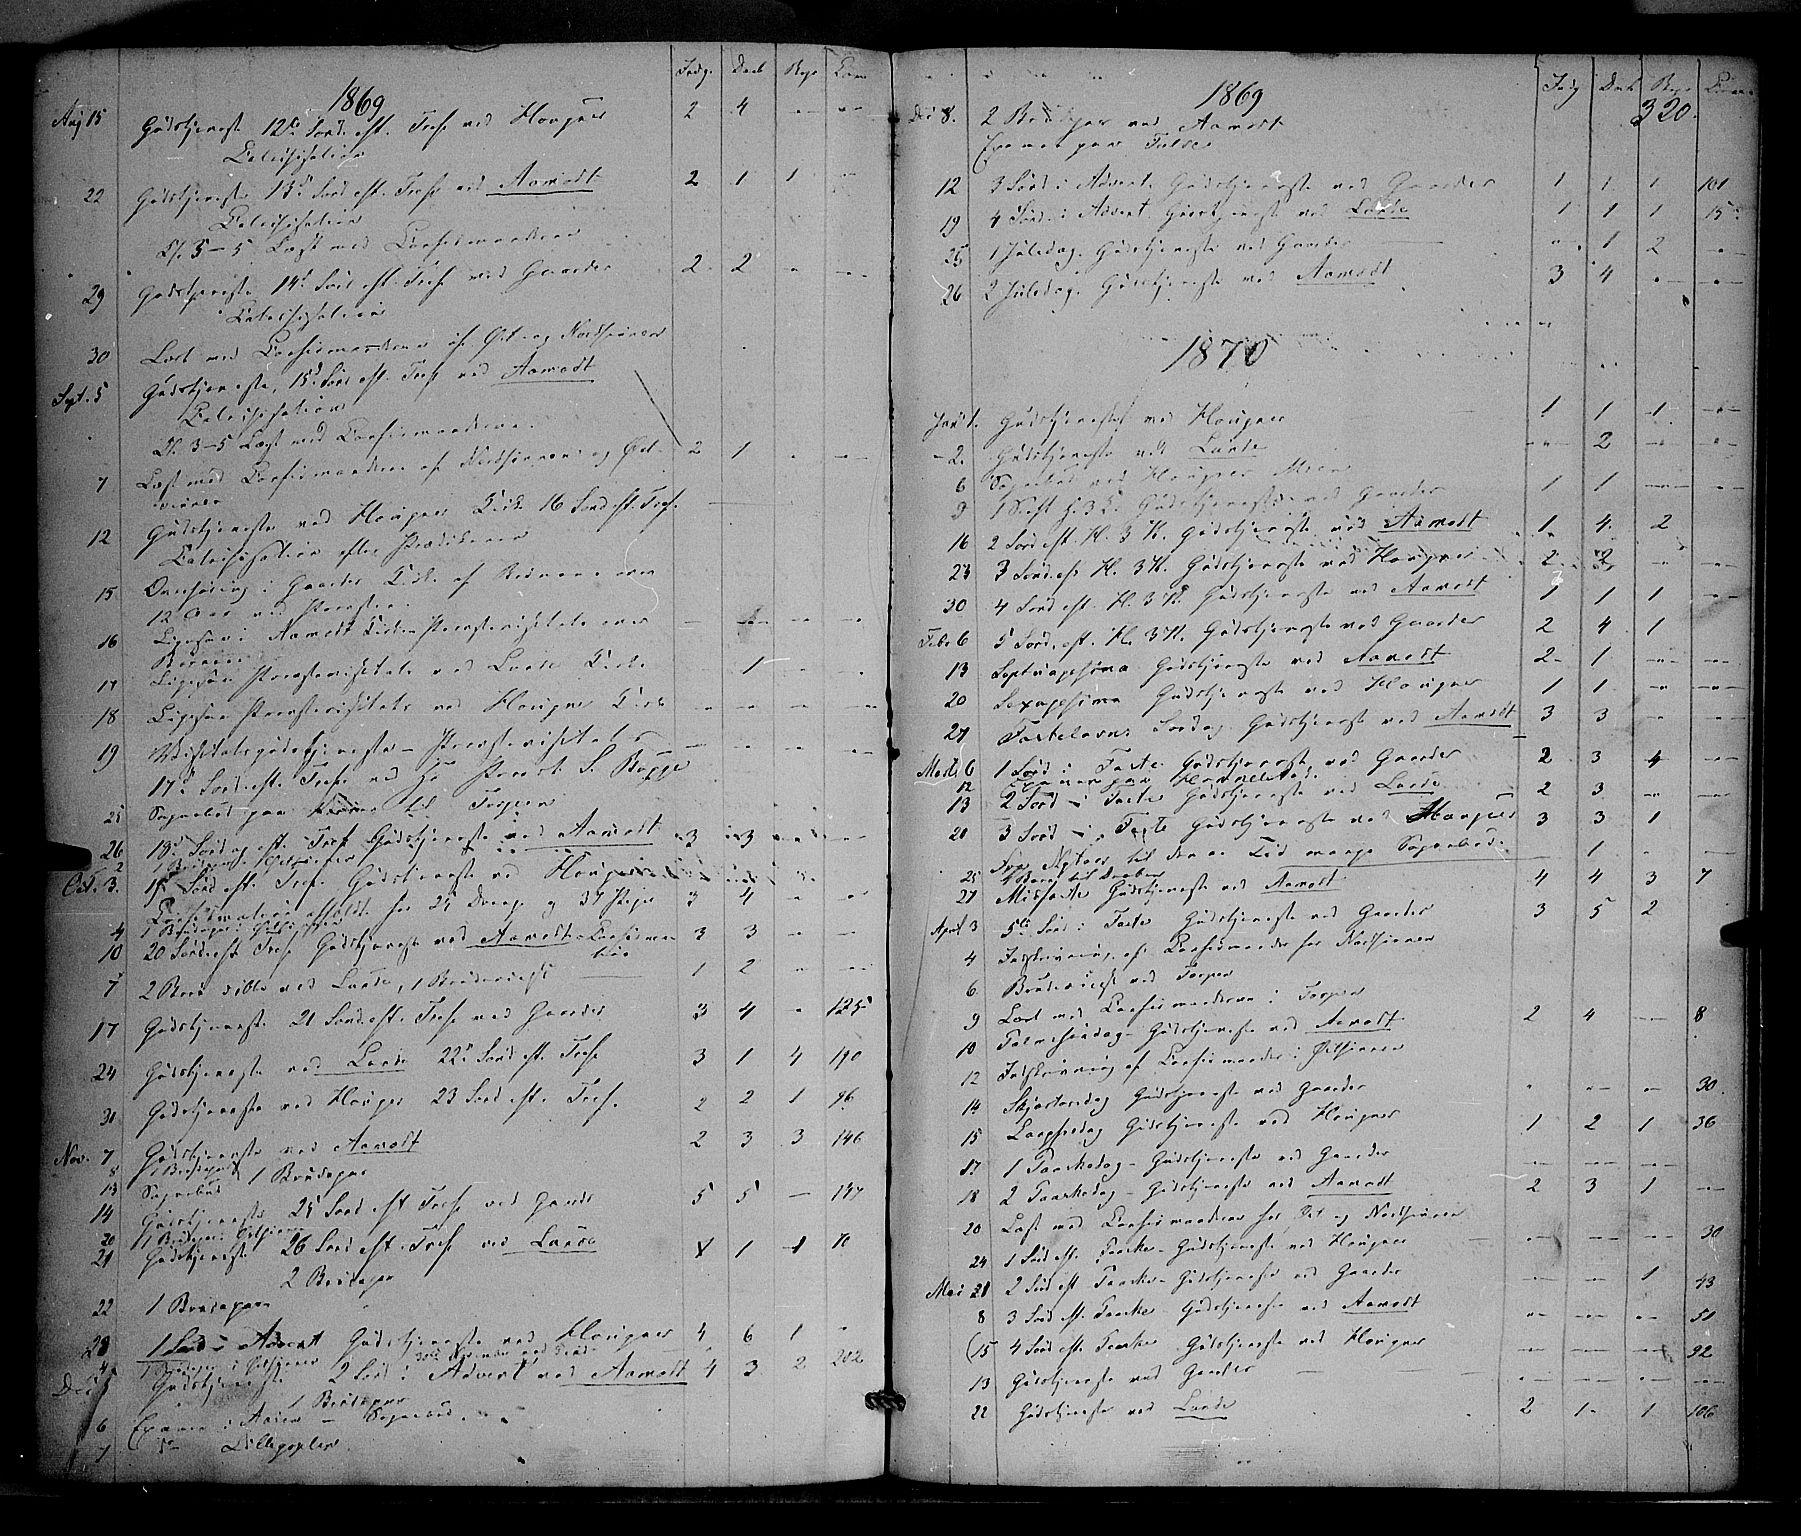 SAH, Nordre Land prestekontor, Ministerialbok nr. 1, 1860-1871, s. 320